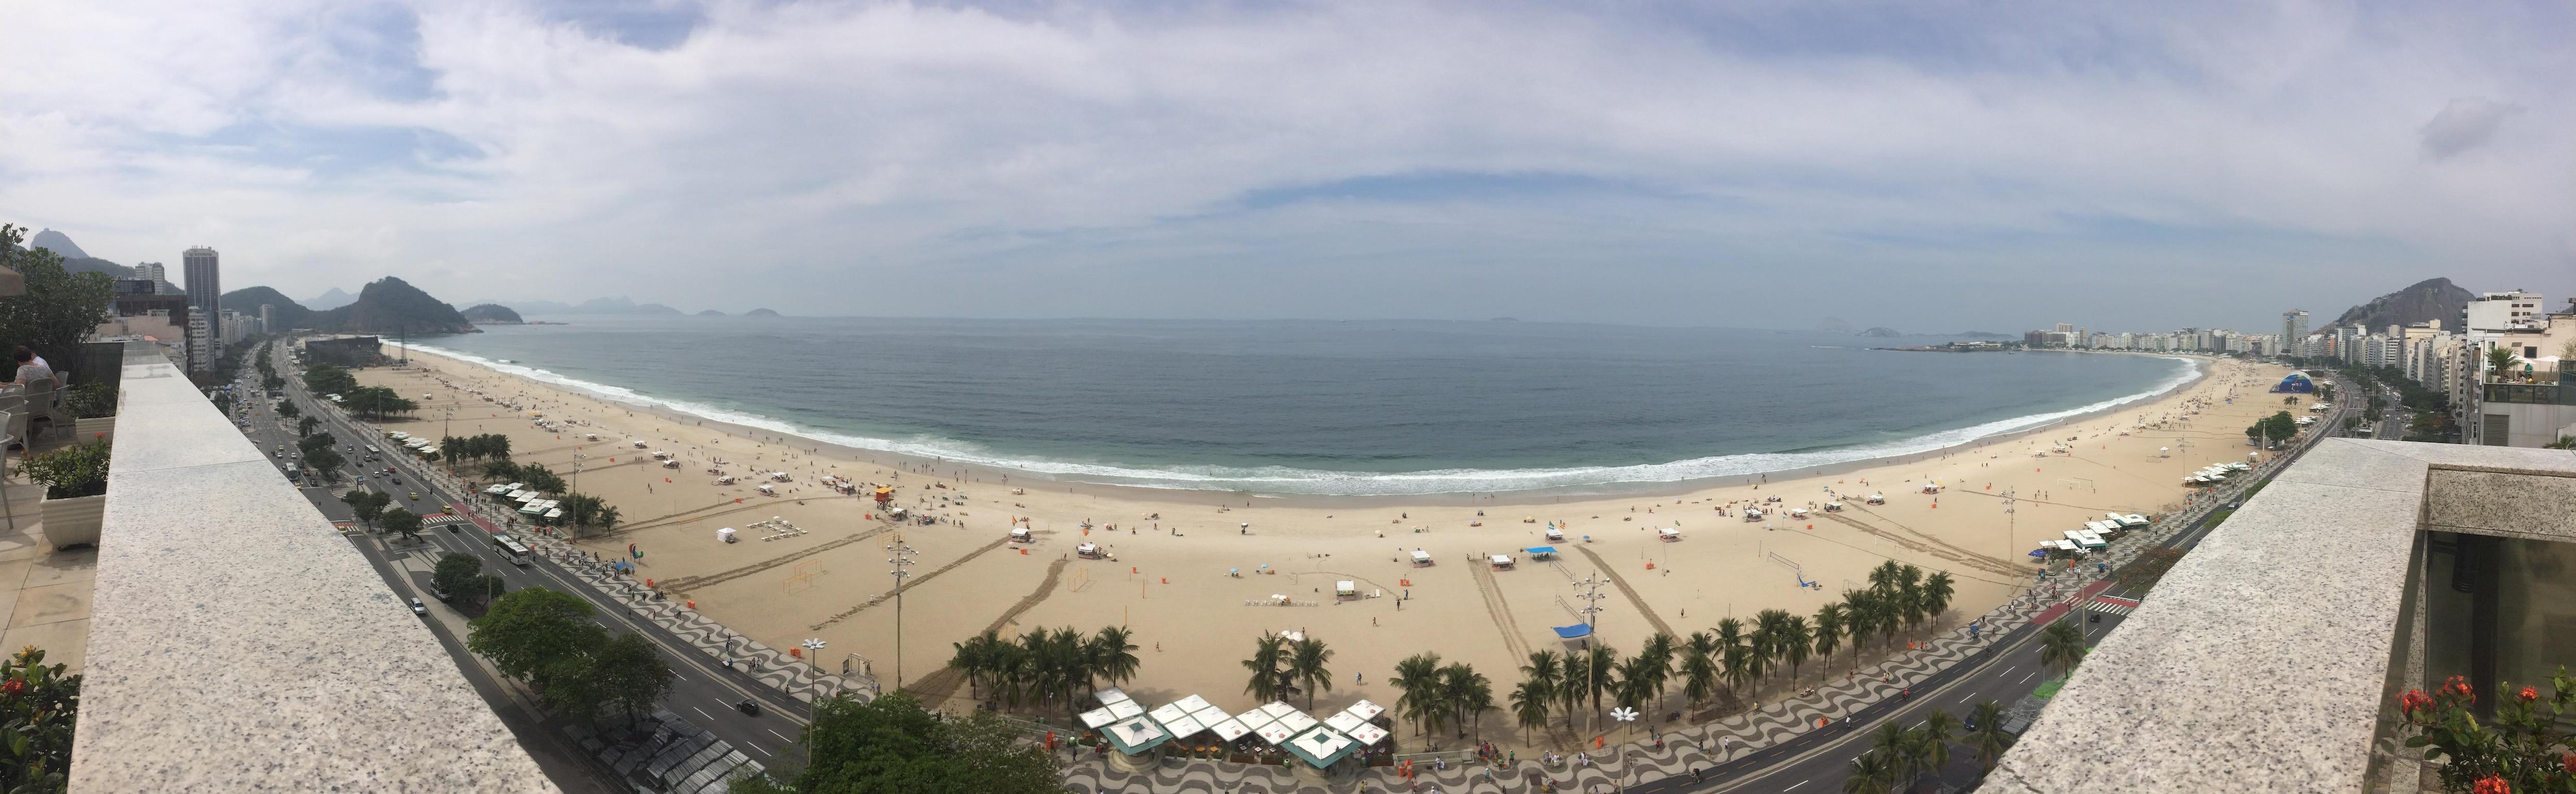 Rooftop Panorama View of Copacabana Beach